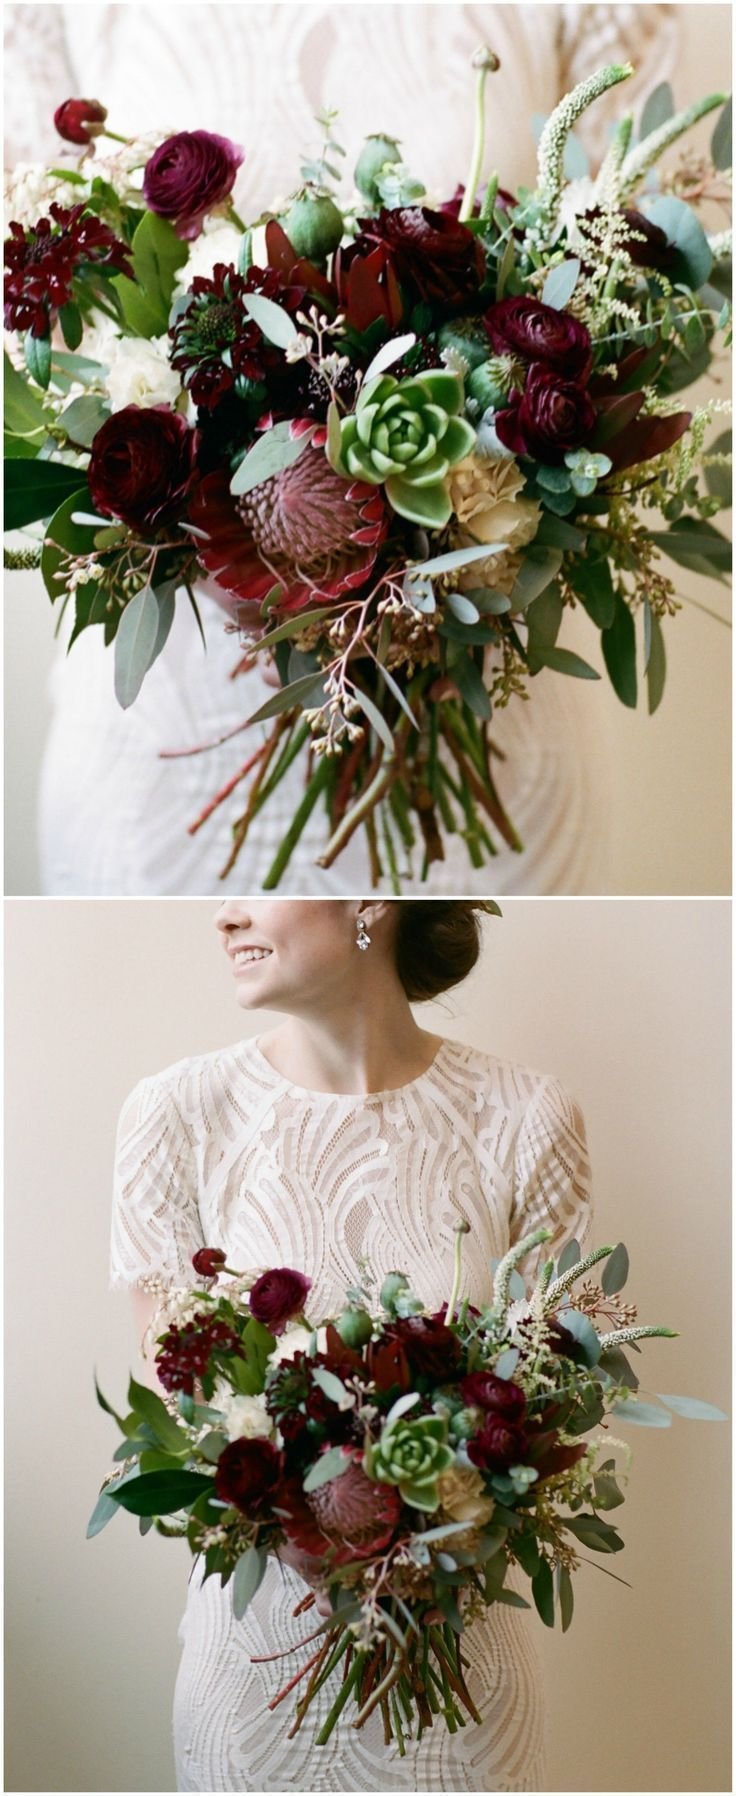 best marriage images on pinterest dream wedding wedding stuff